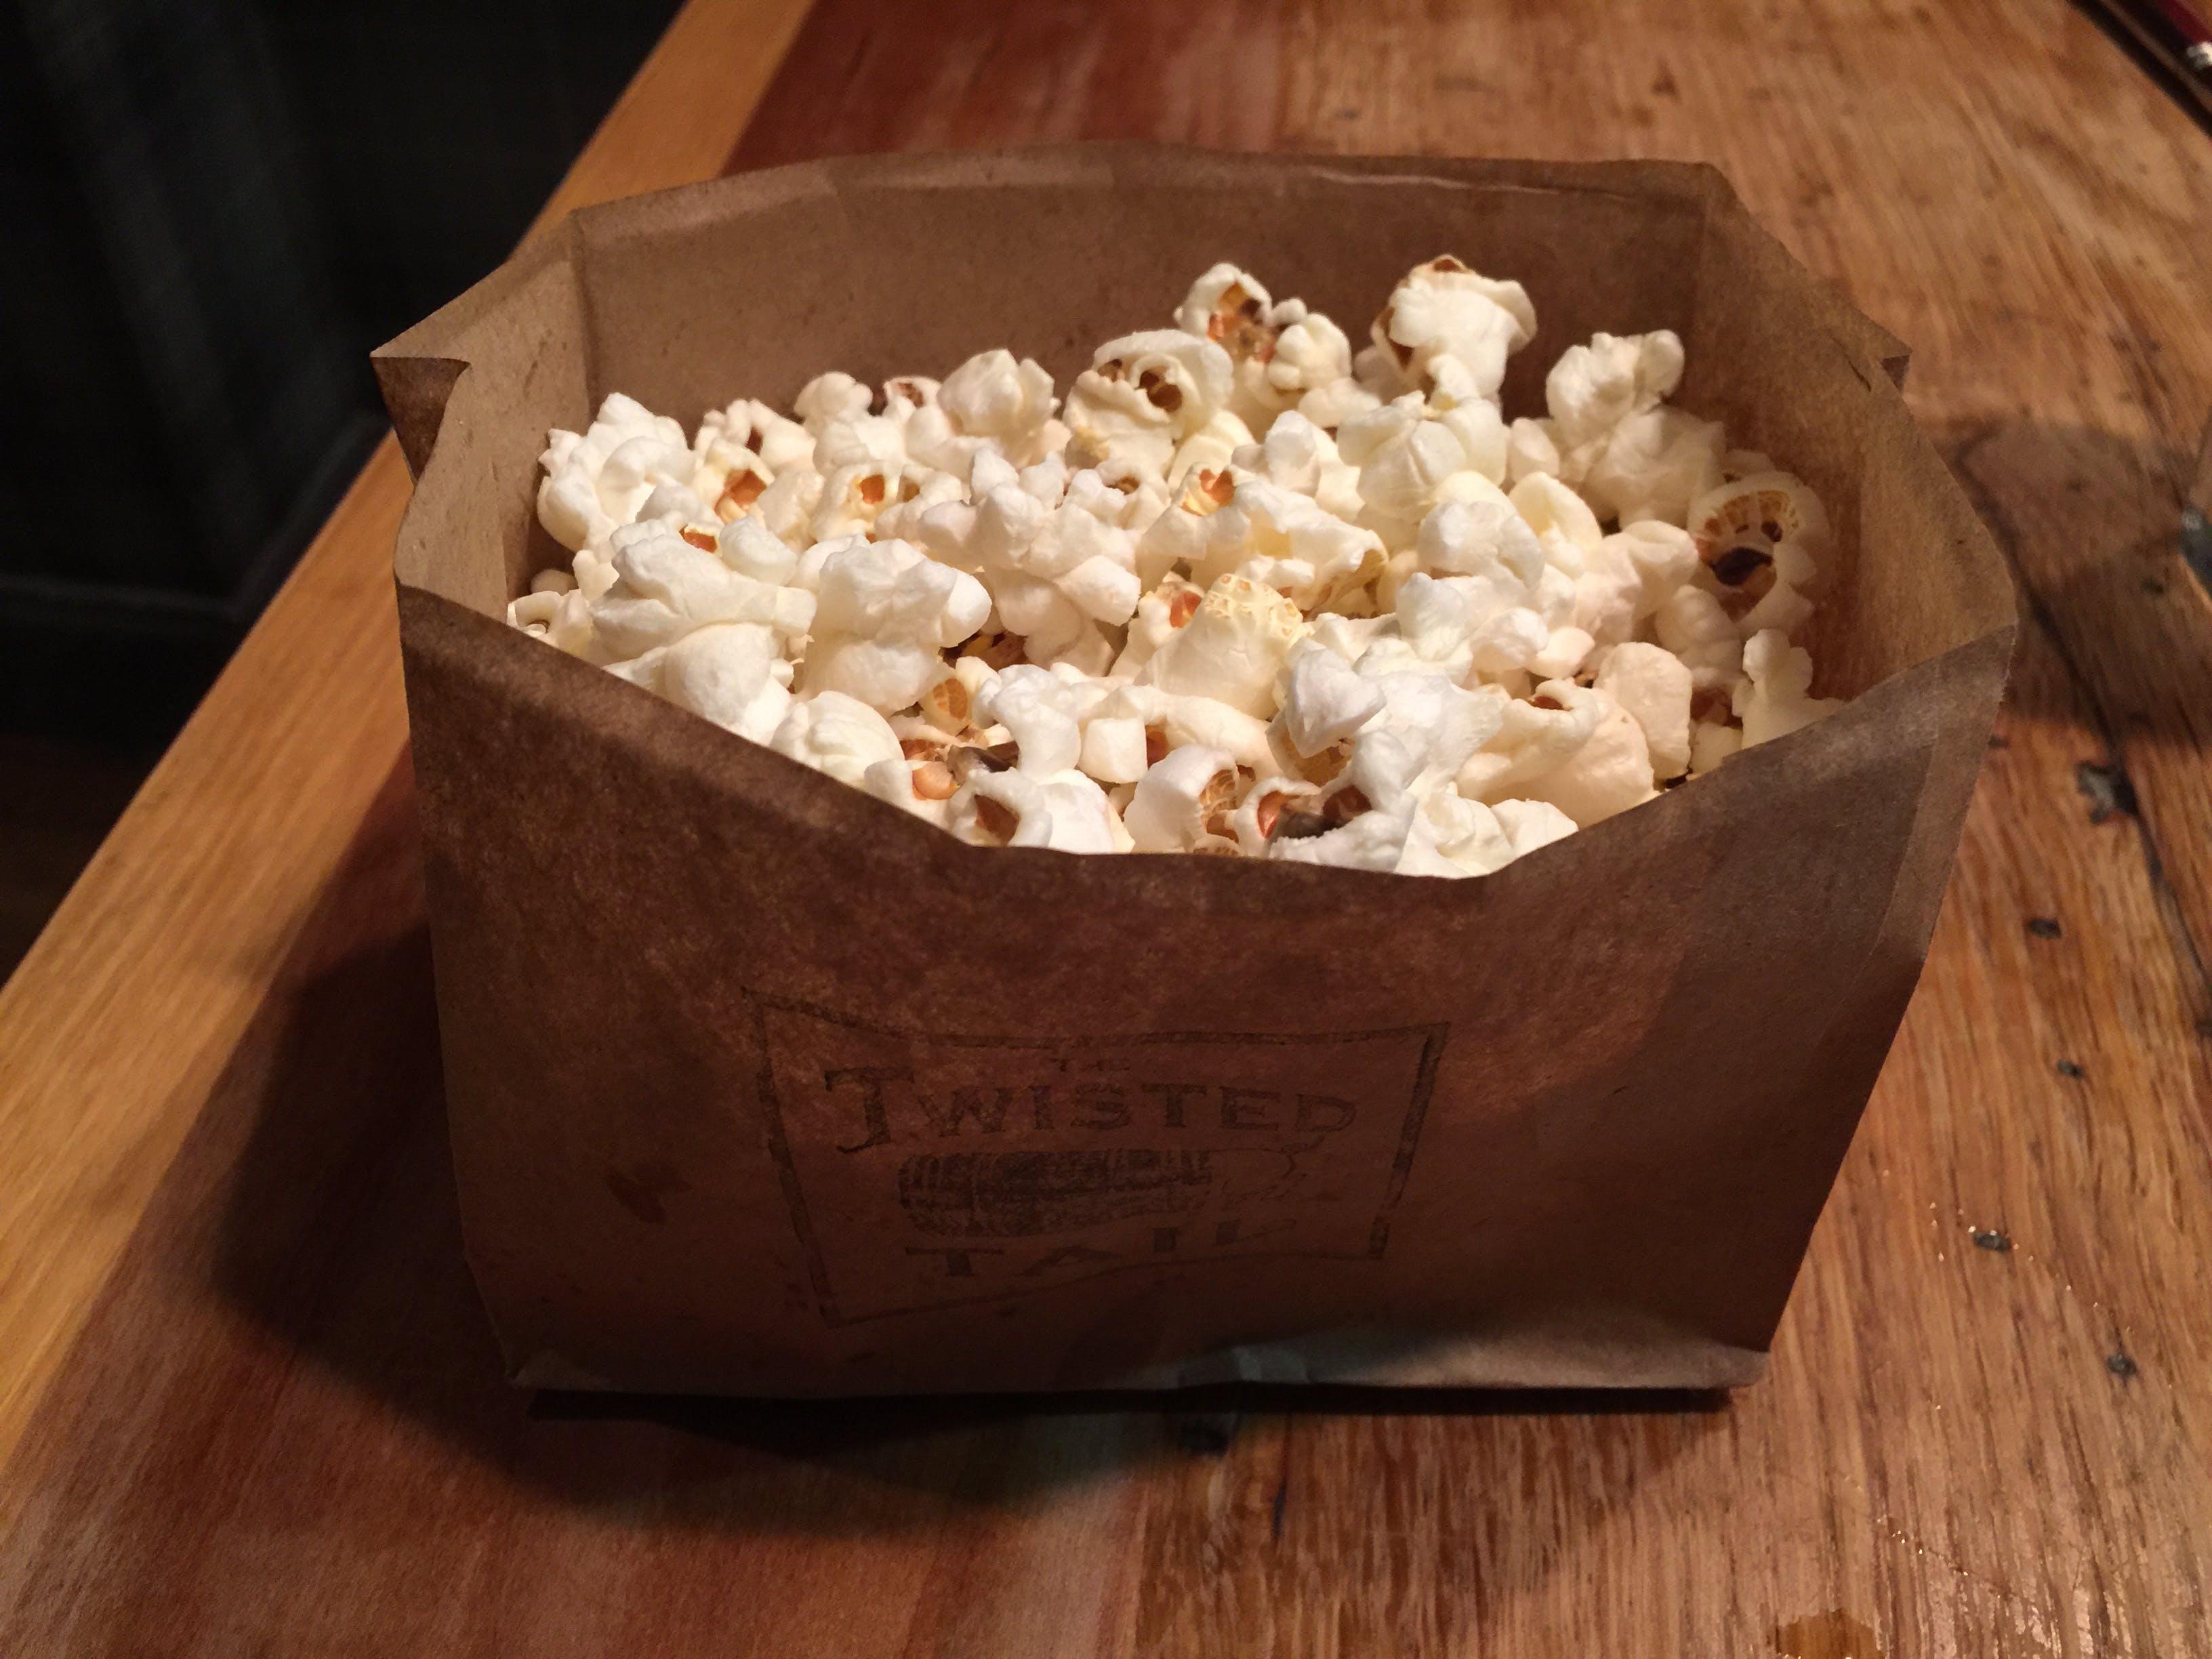 Free stock photo of paper bag, popcorn, snack